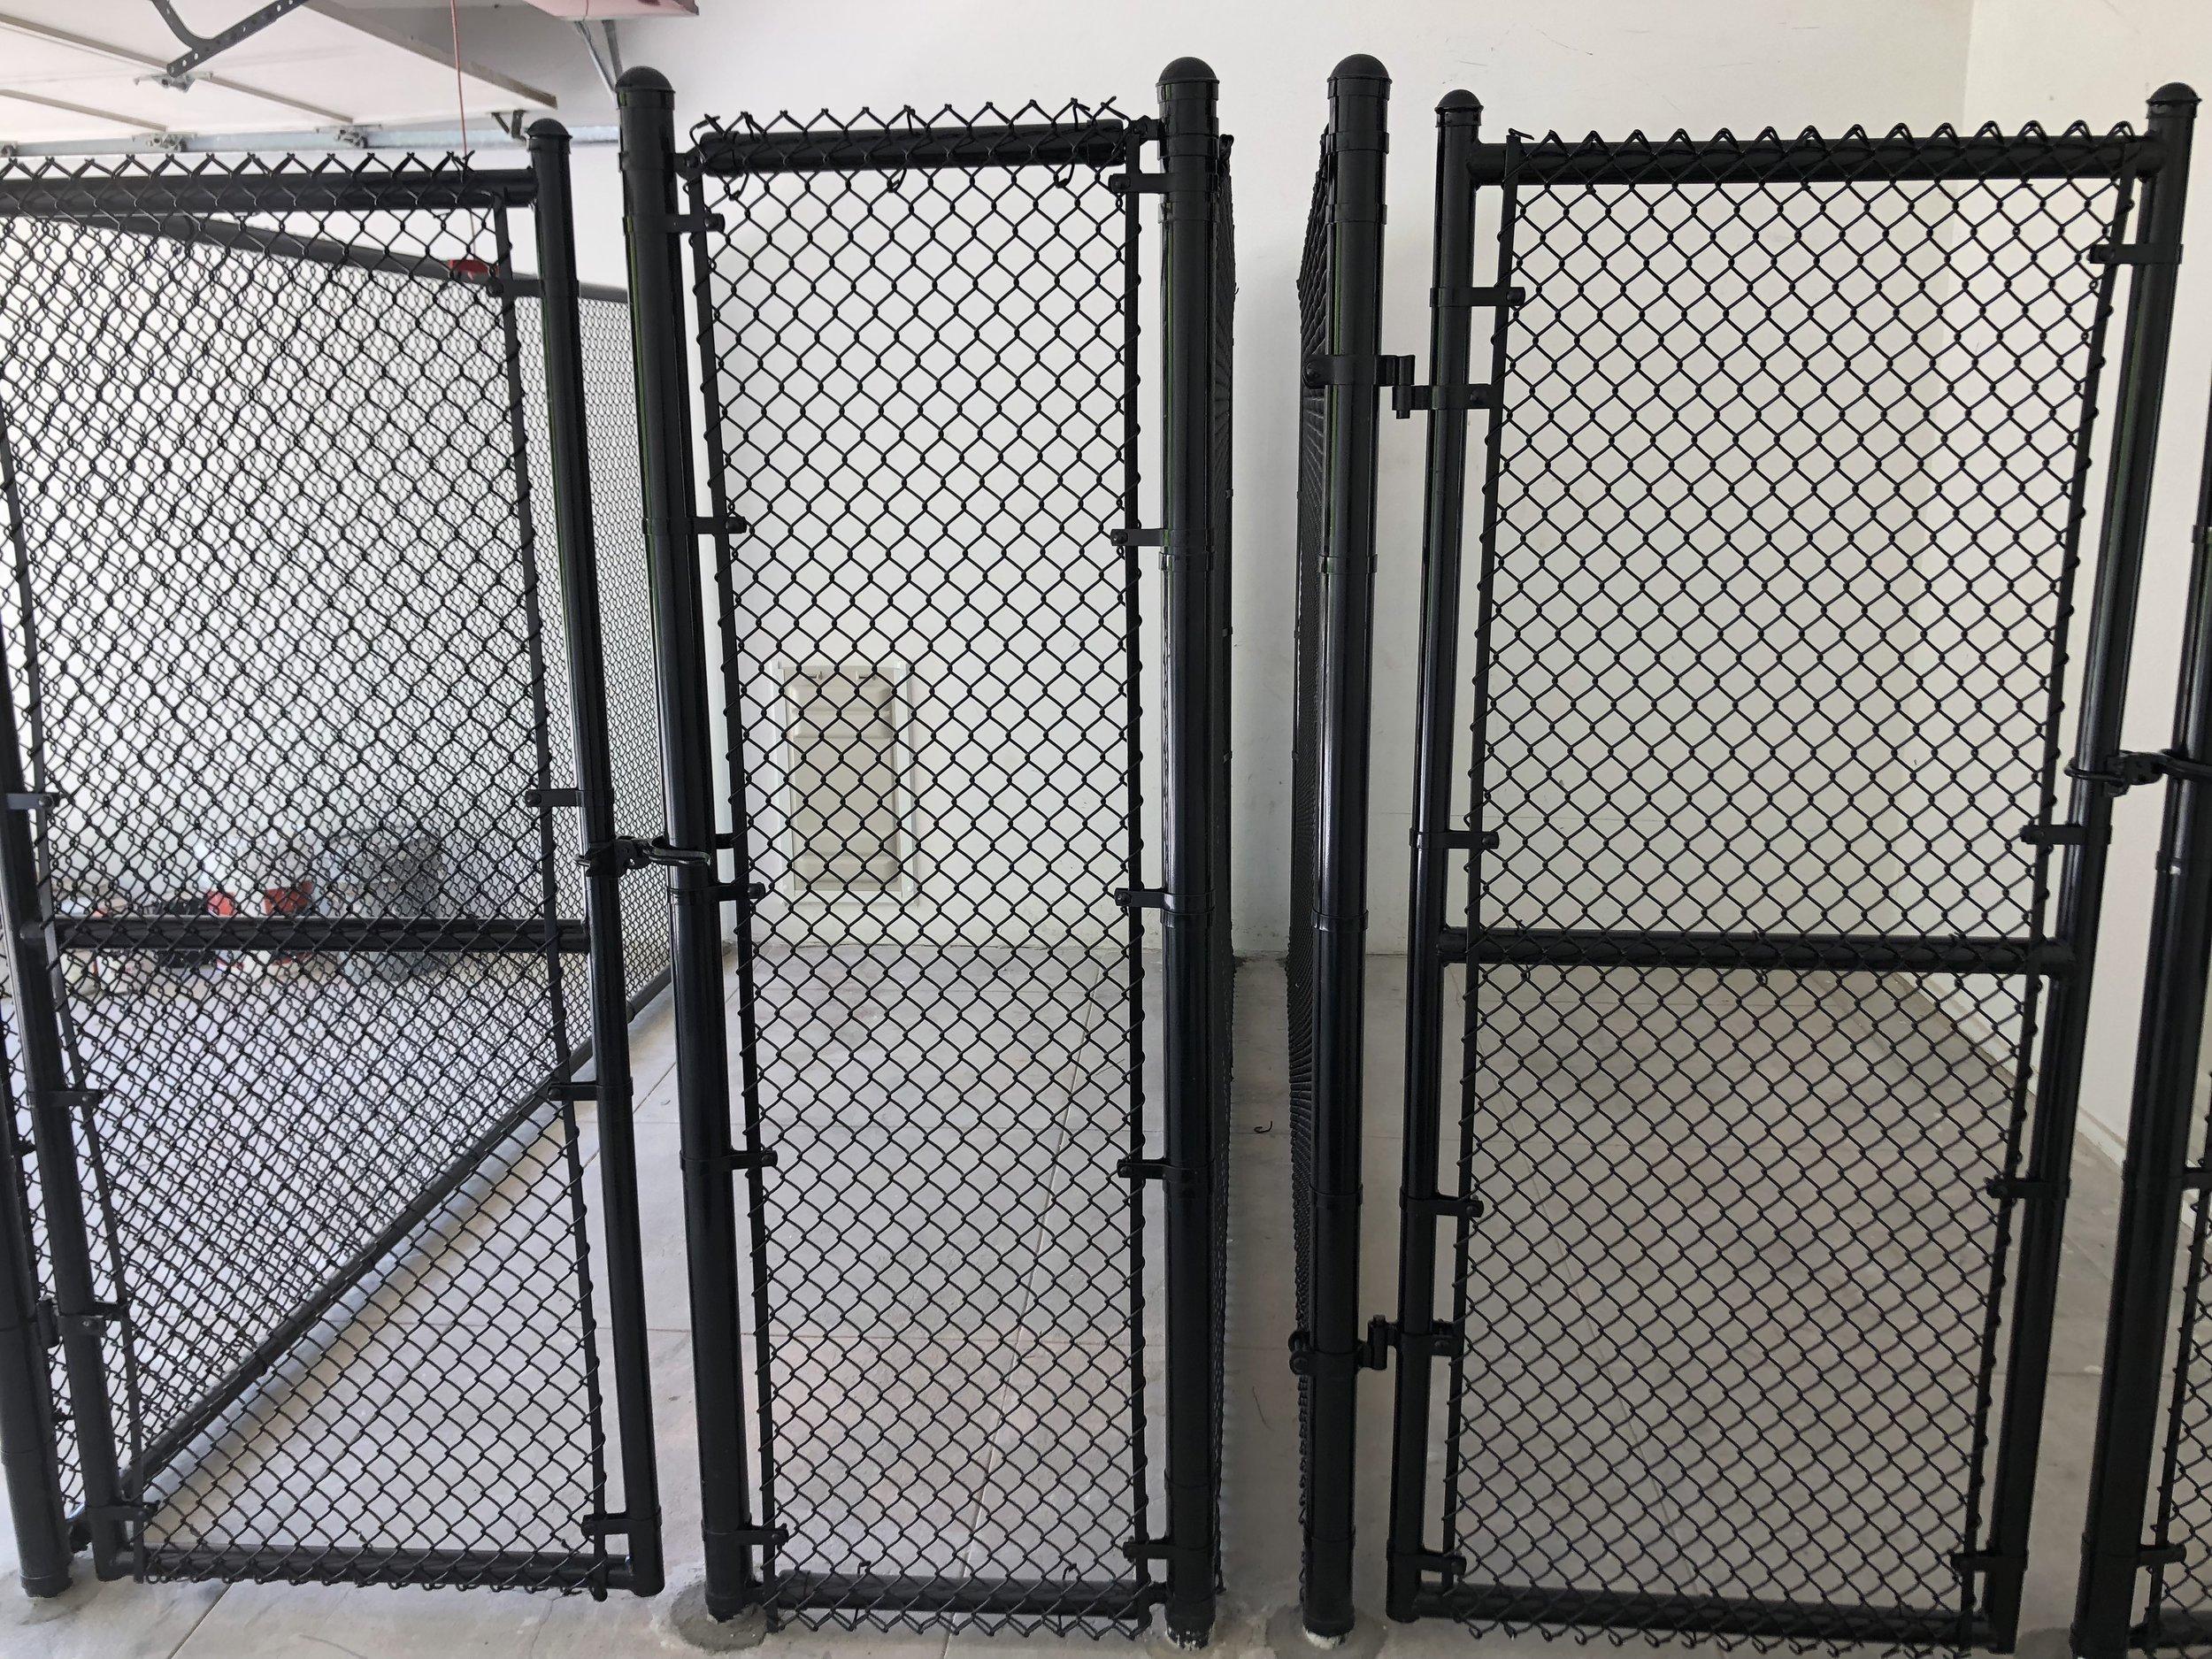 Black Vinyl Coated Chain Link Los Angeles Fence Buiders.jpeg